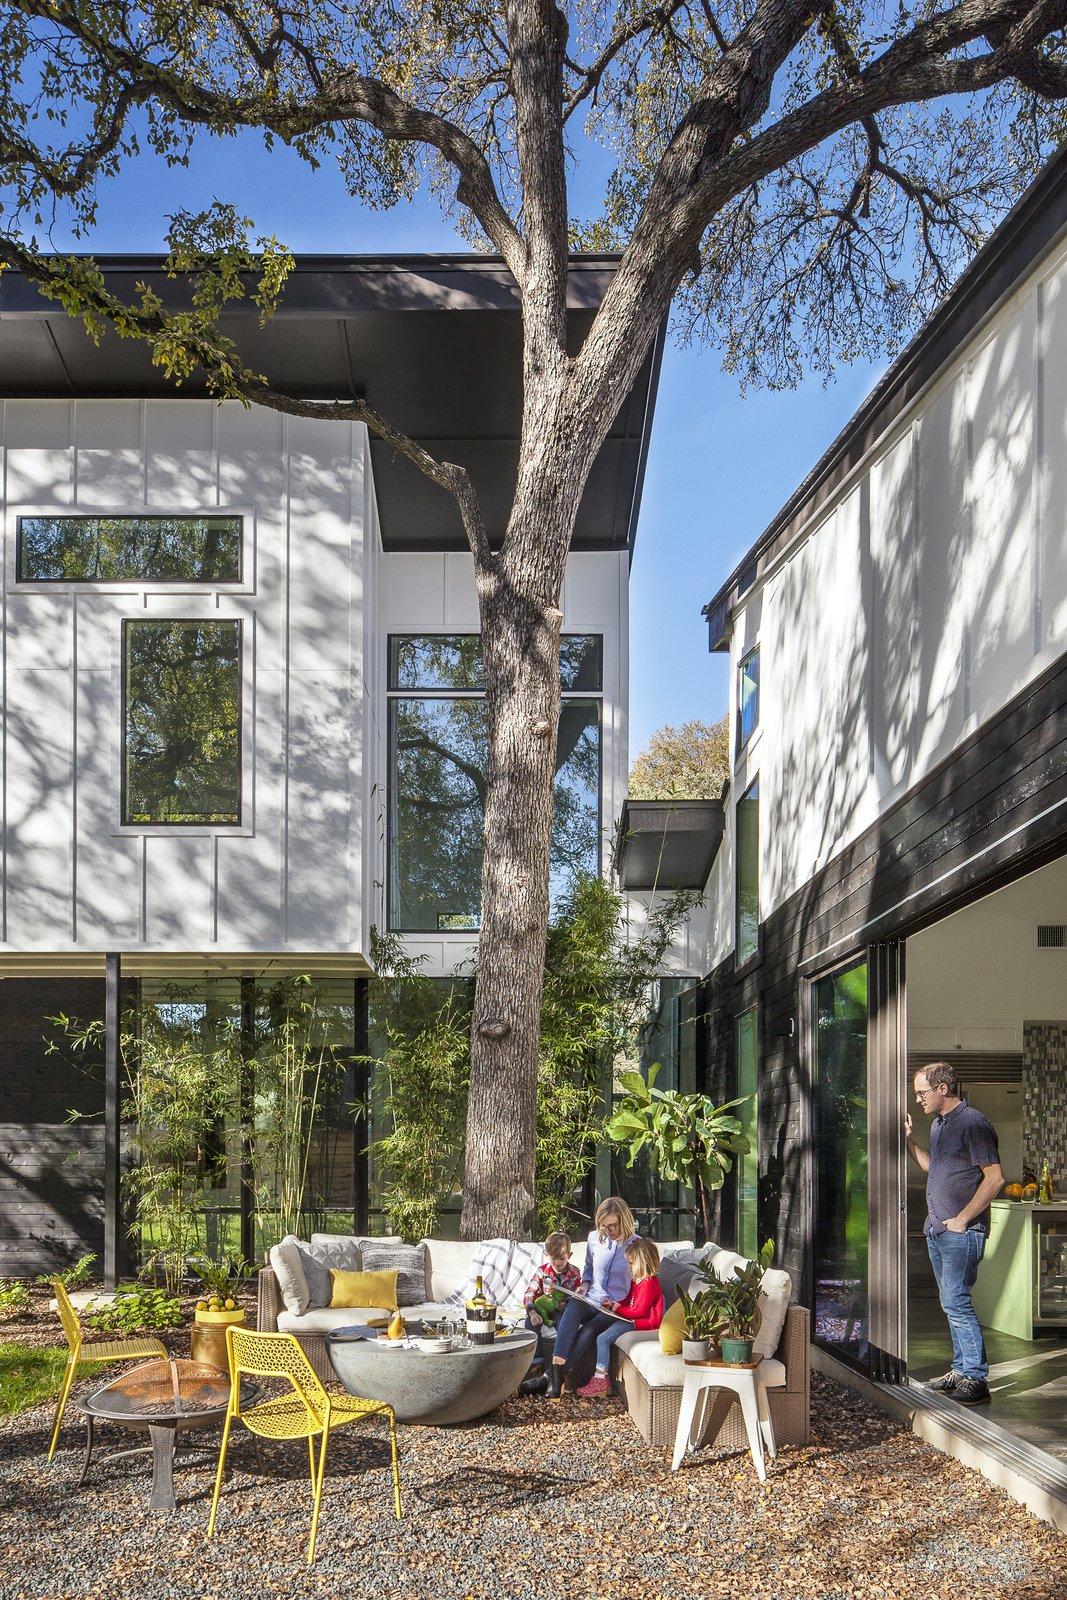 Strass Residence by Matt Fajkus Architecture | Photography: Atelier Wong Photography  Strass Residence by Matt Fajkus Architecture